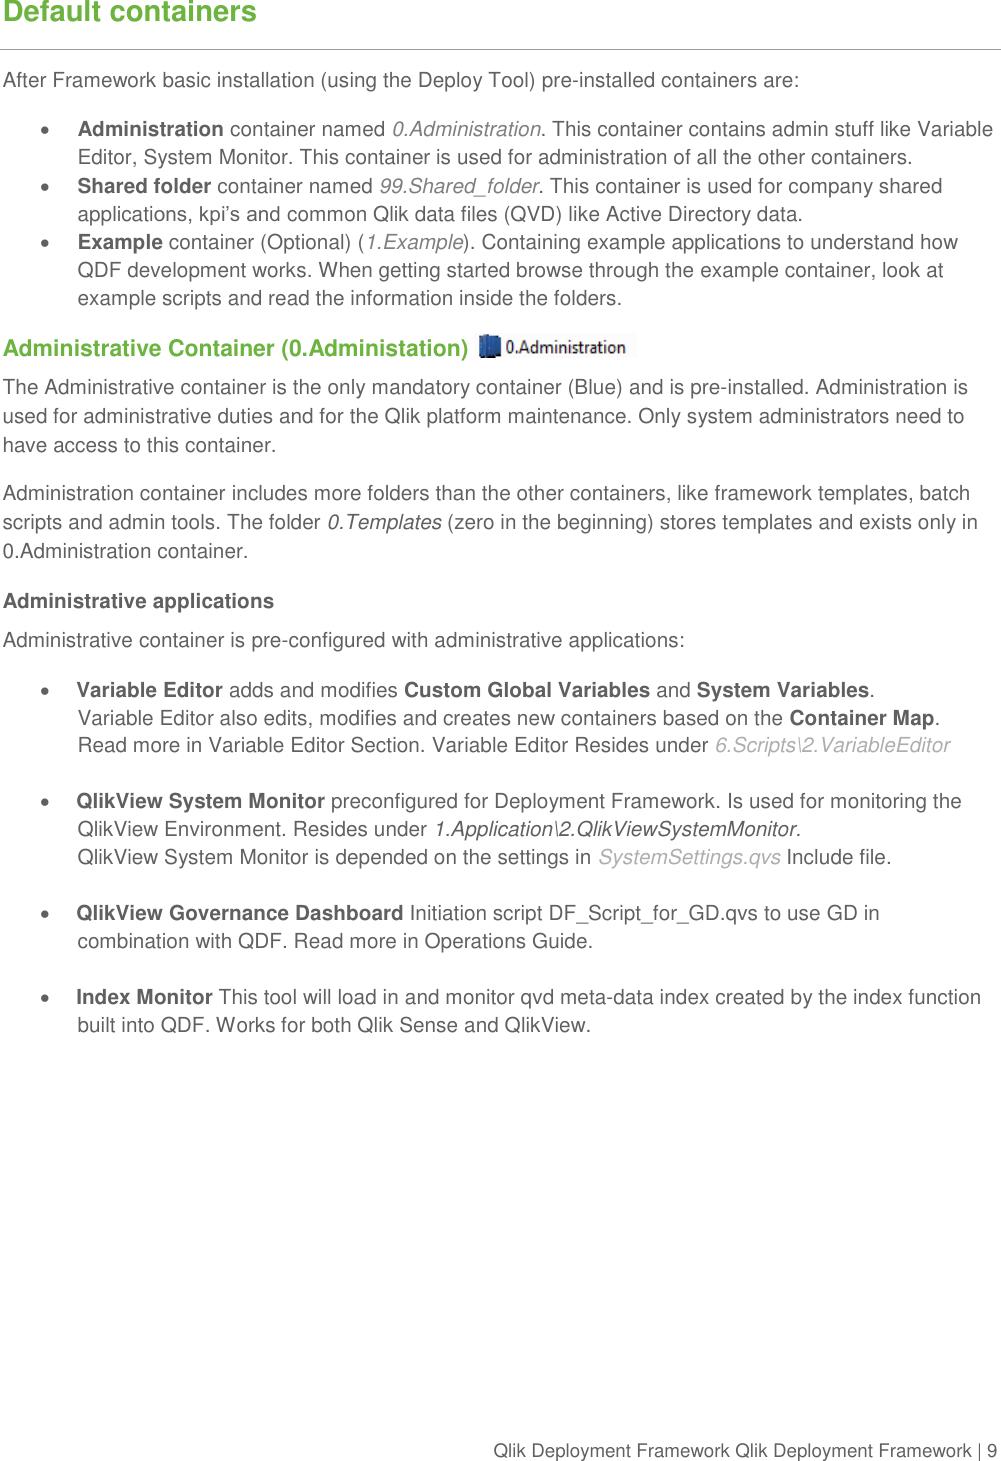 Qlik Deployment Framework View Getting Started Guide